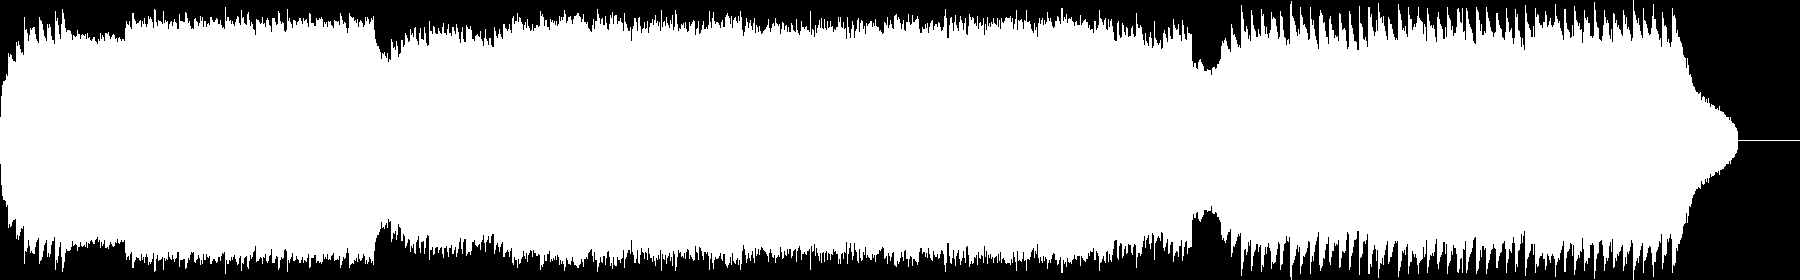 The Grid audio waveform